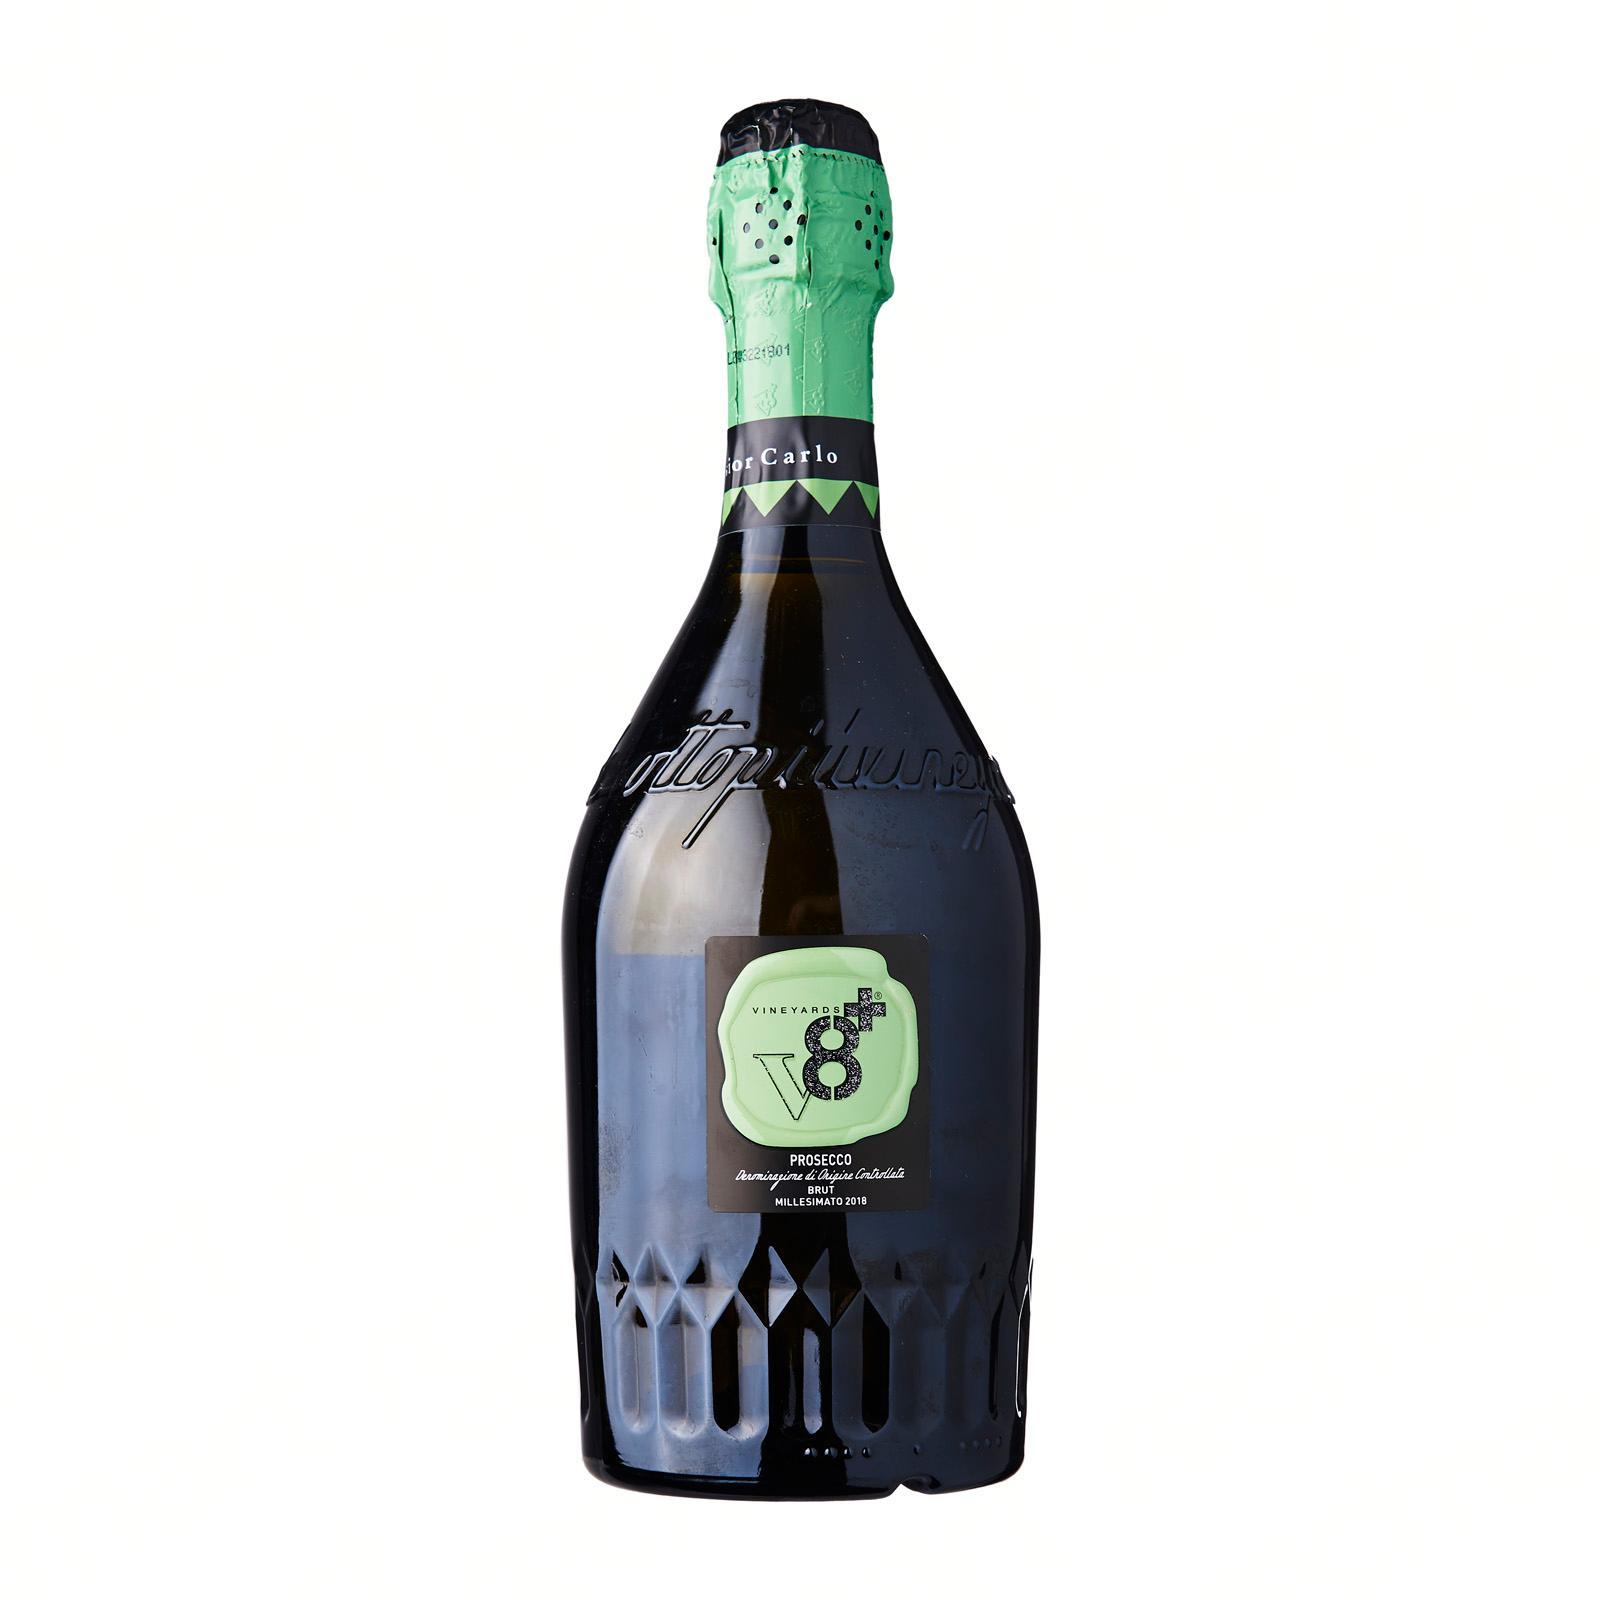 Vineyards V8+ Prosecco Doc Millesimato Brut Sior Carlo